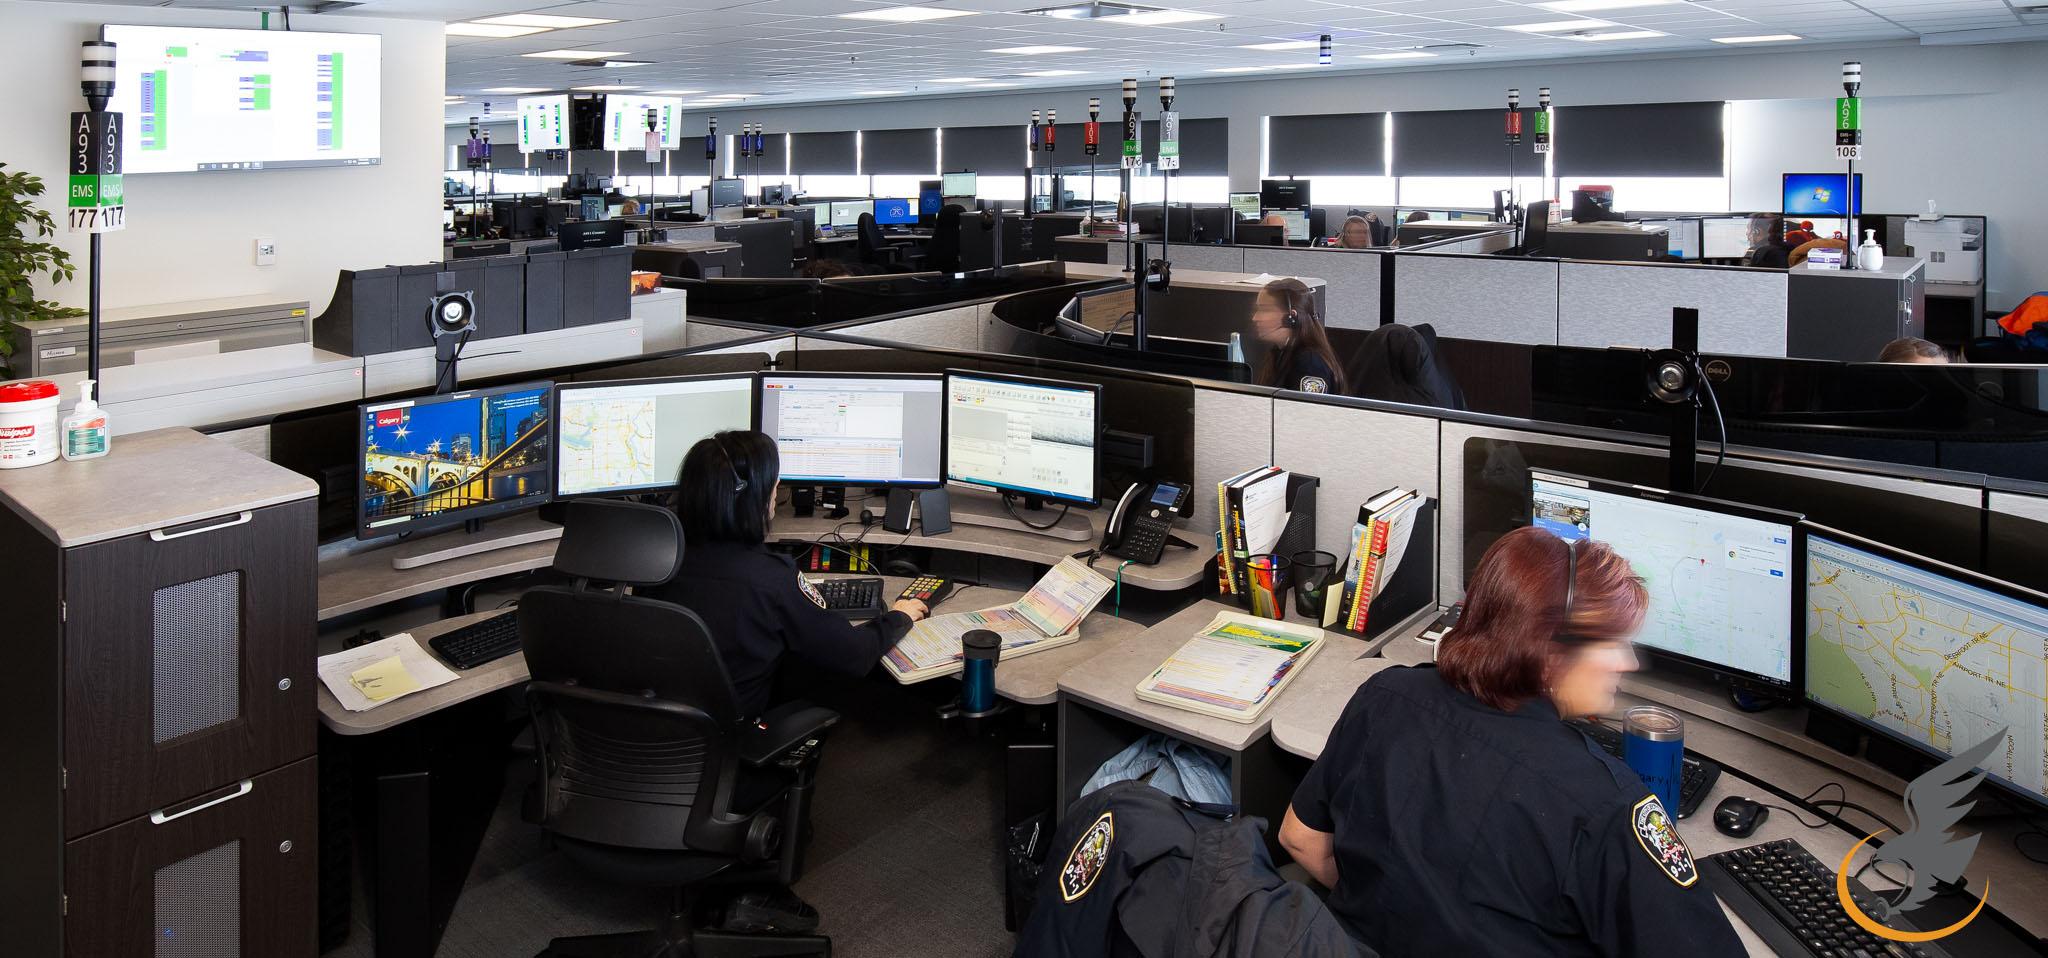 City of Calgary 911, Alberta Canada